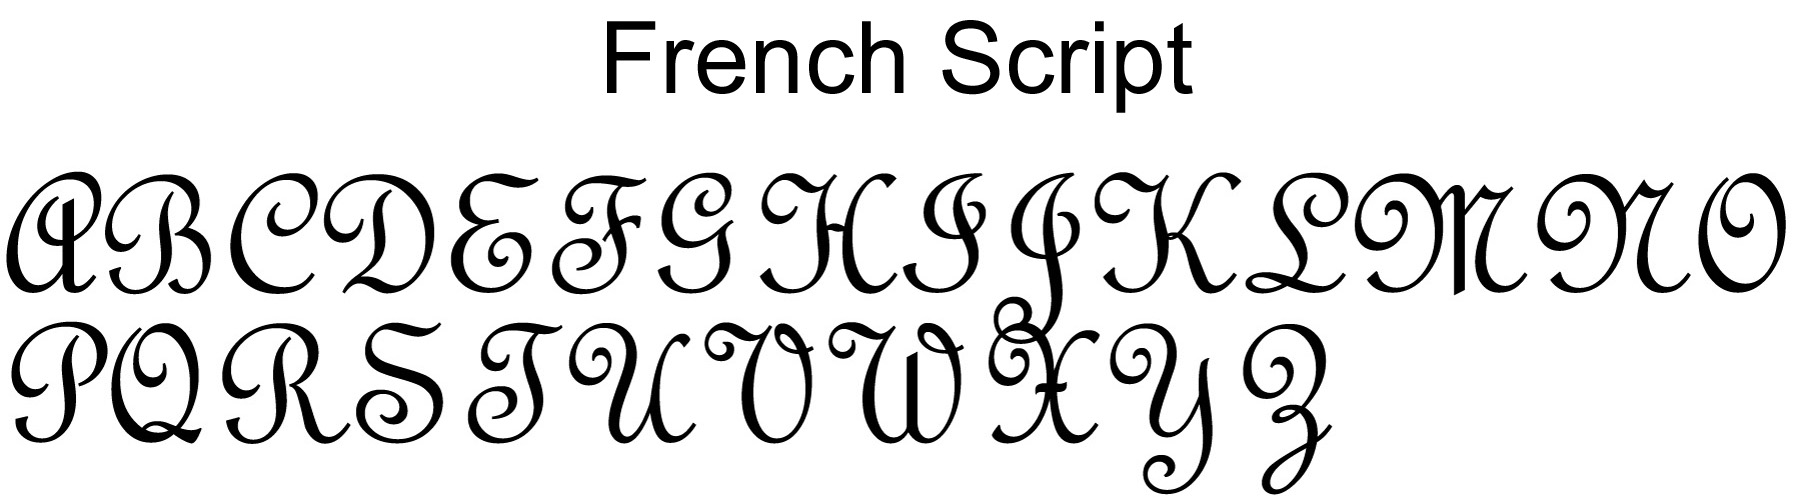 Monogram Script Font